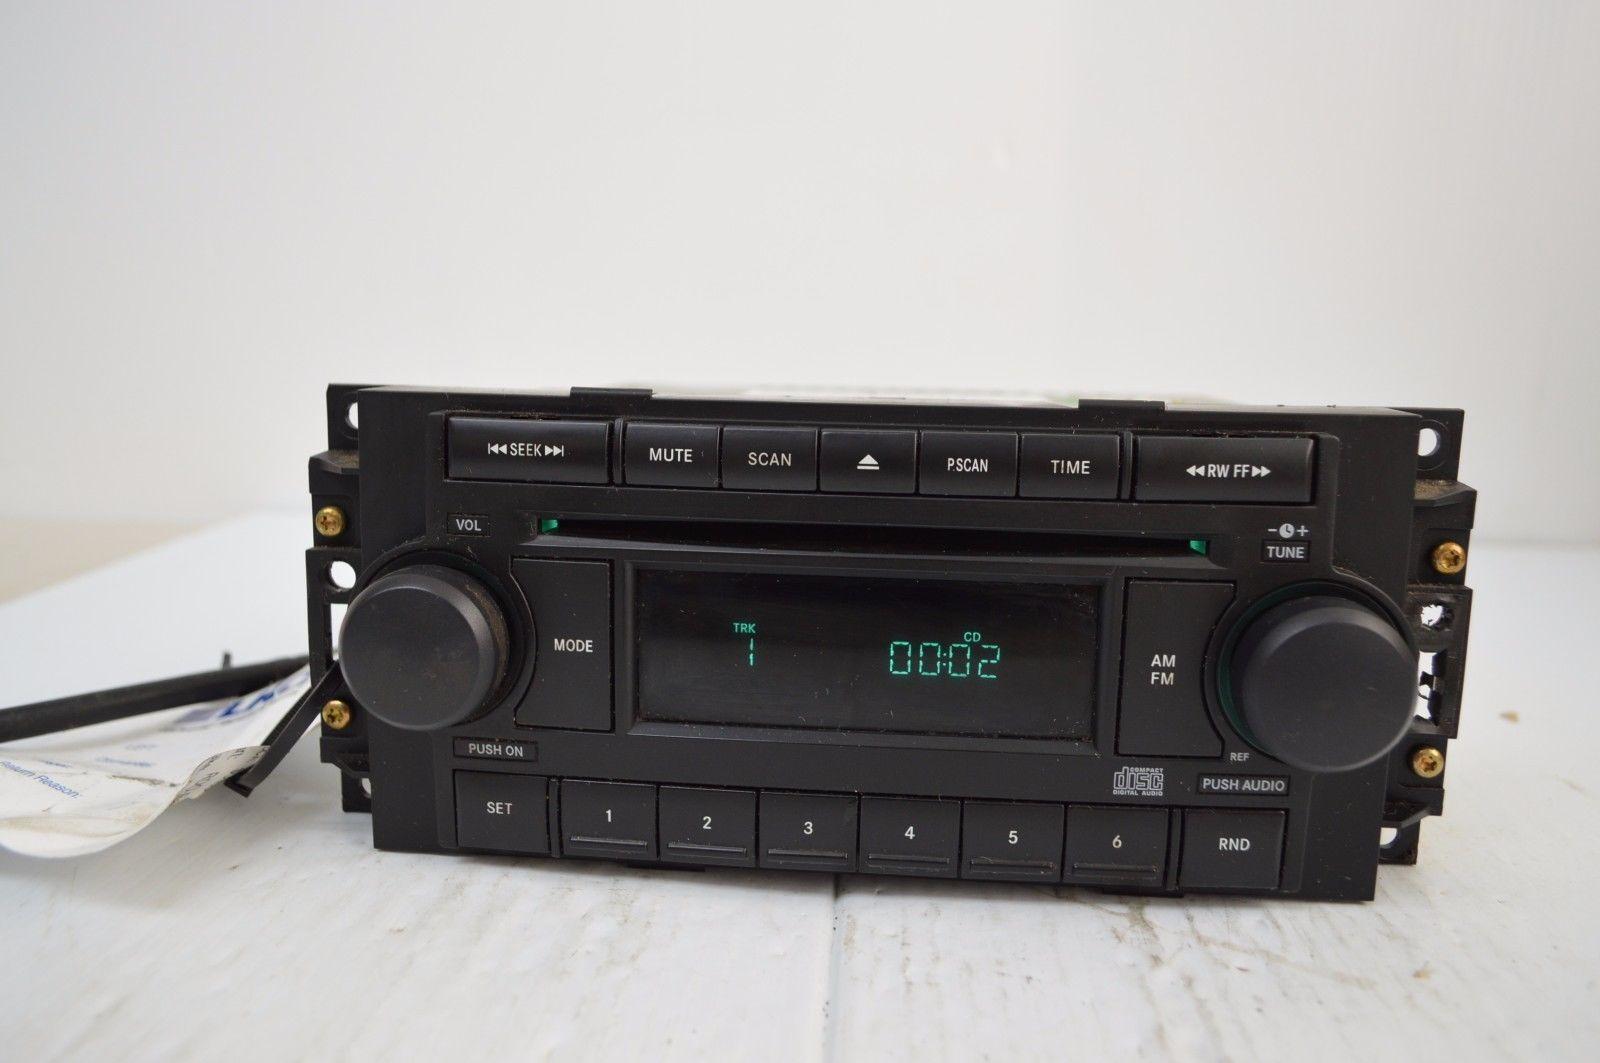 2004-2010 Chrysler Dodge Jeep Radio Cd MP3 AUX IPOD TESTED P05091710AG N49#019 image 2